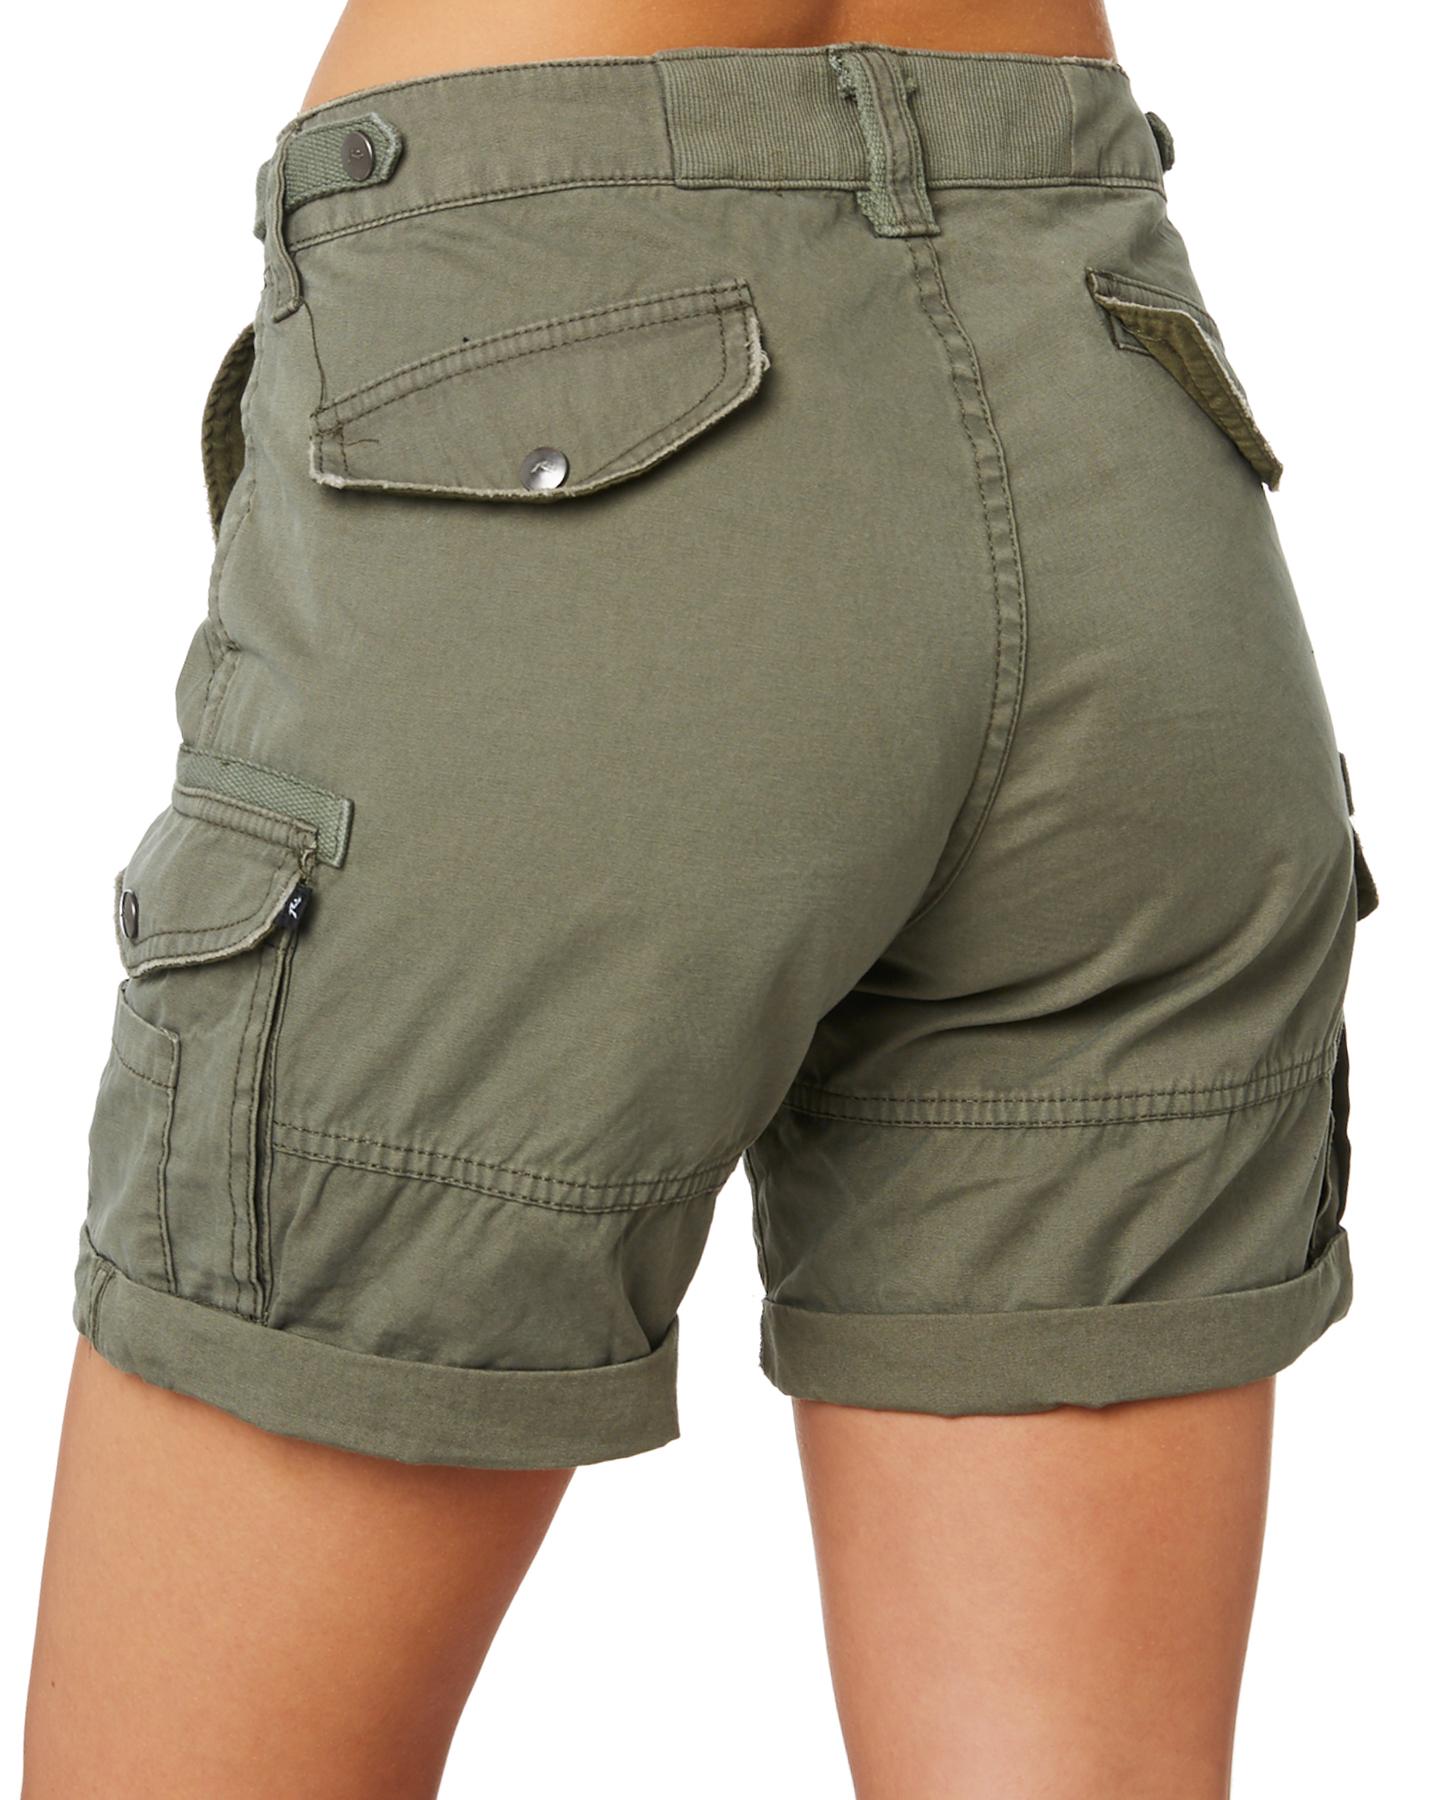 Womens Khaki Cargo Shorts